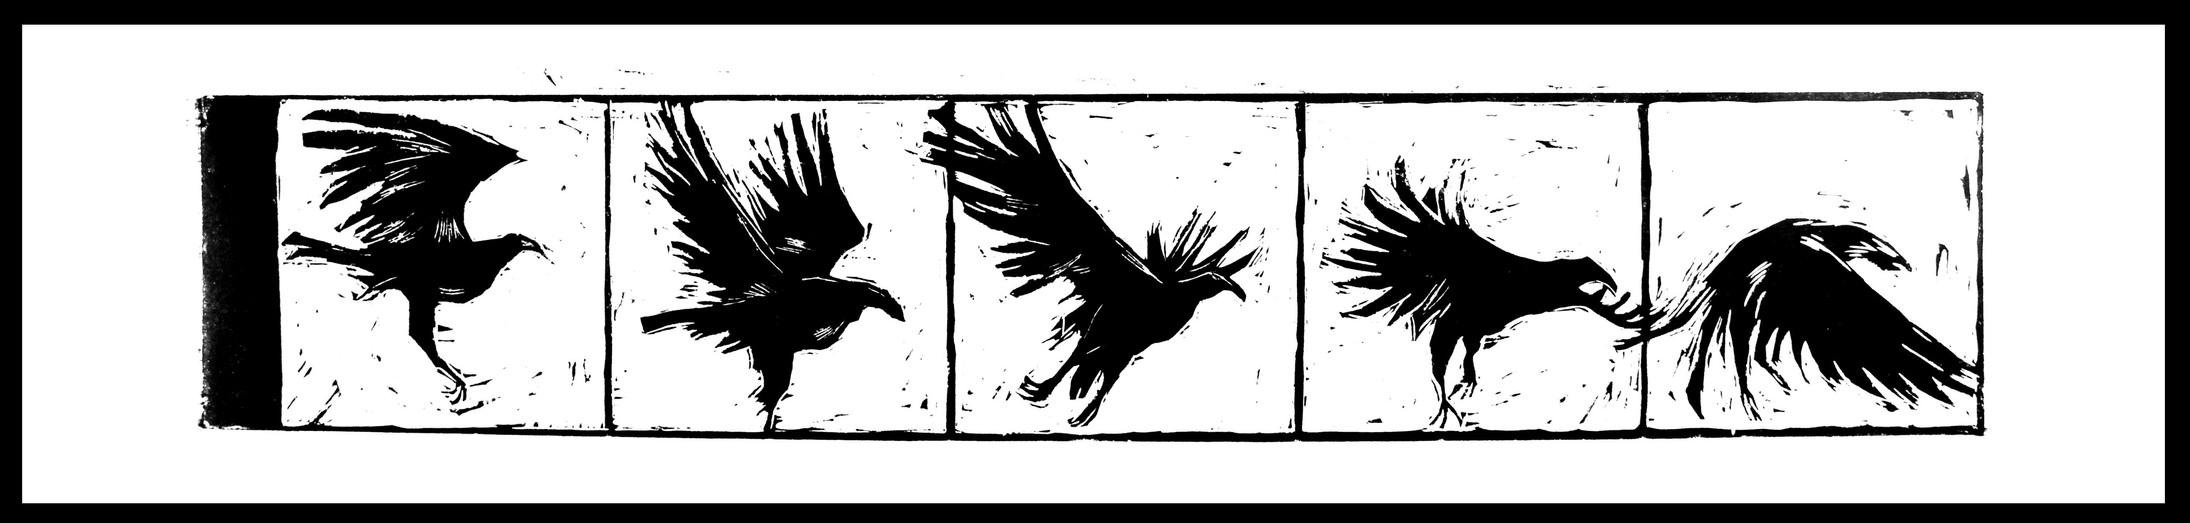 CollapseBirds.jpg